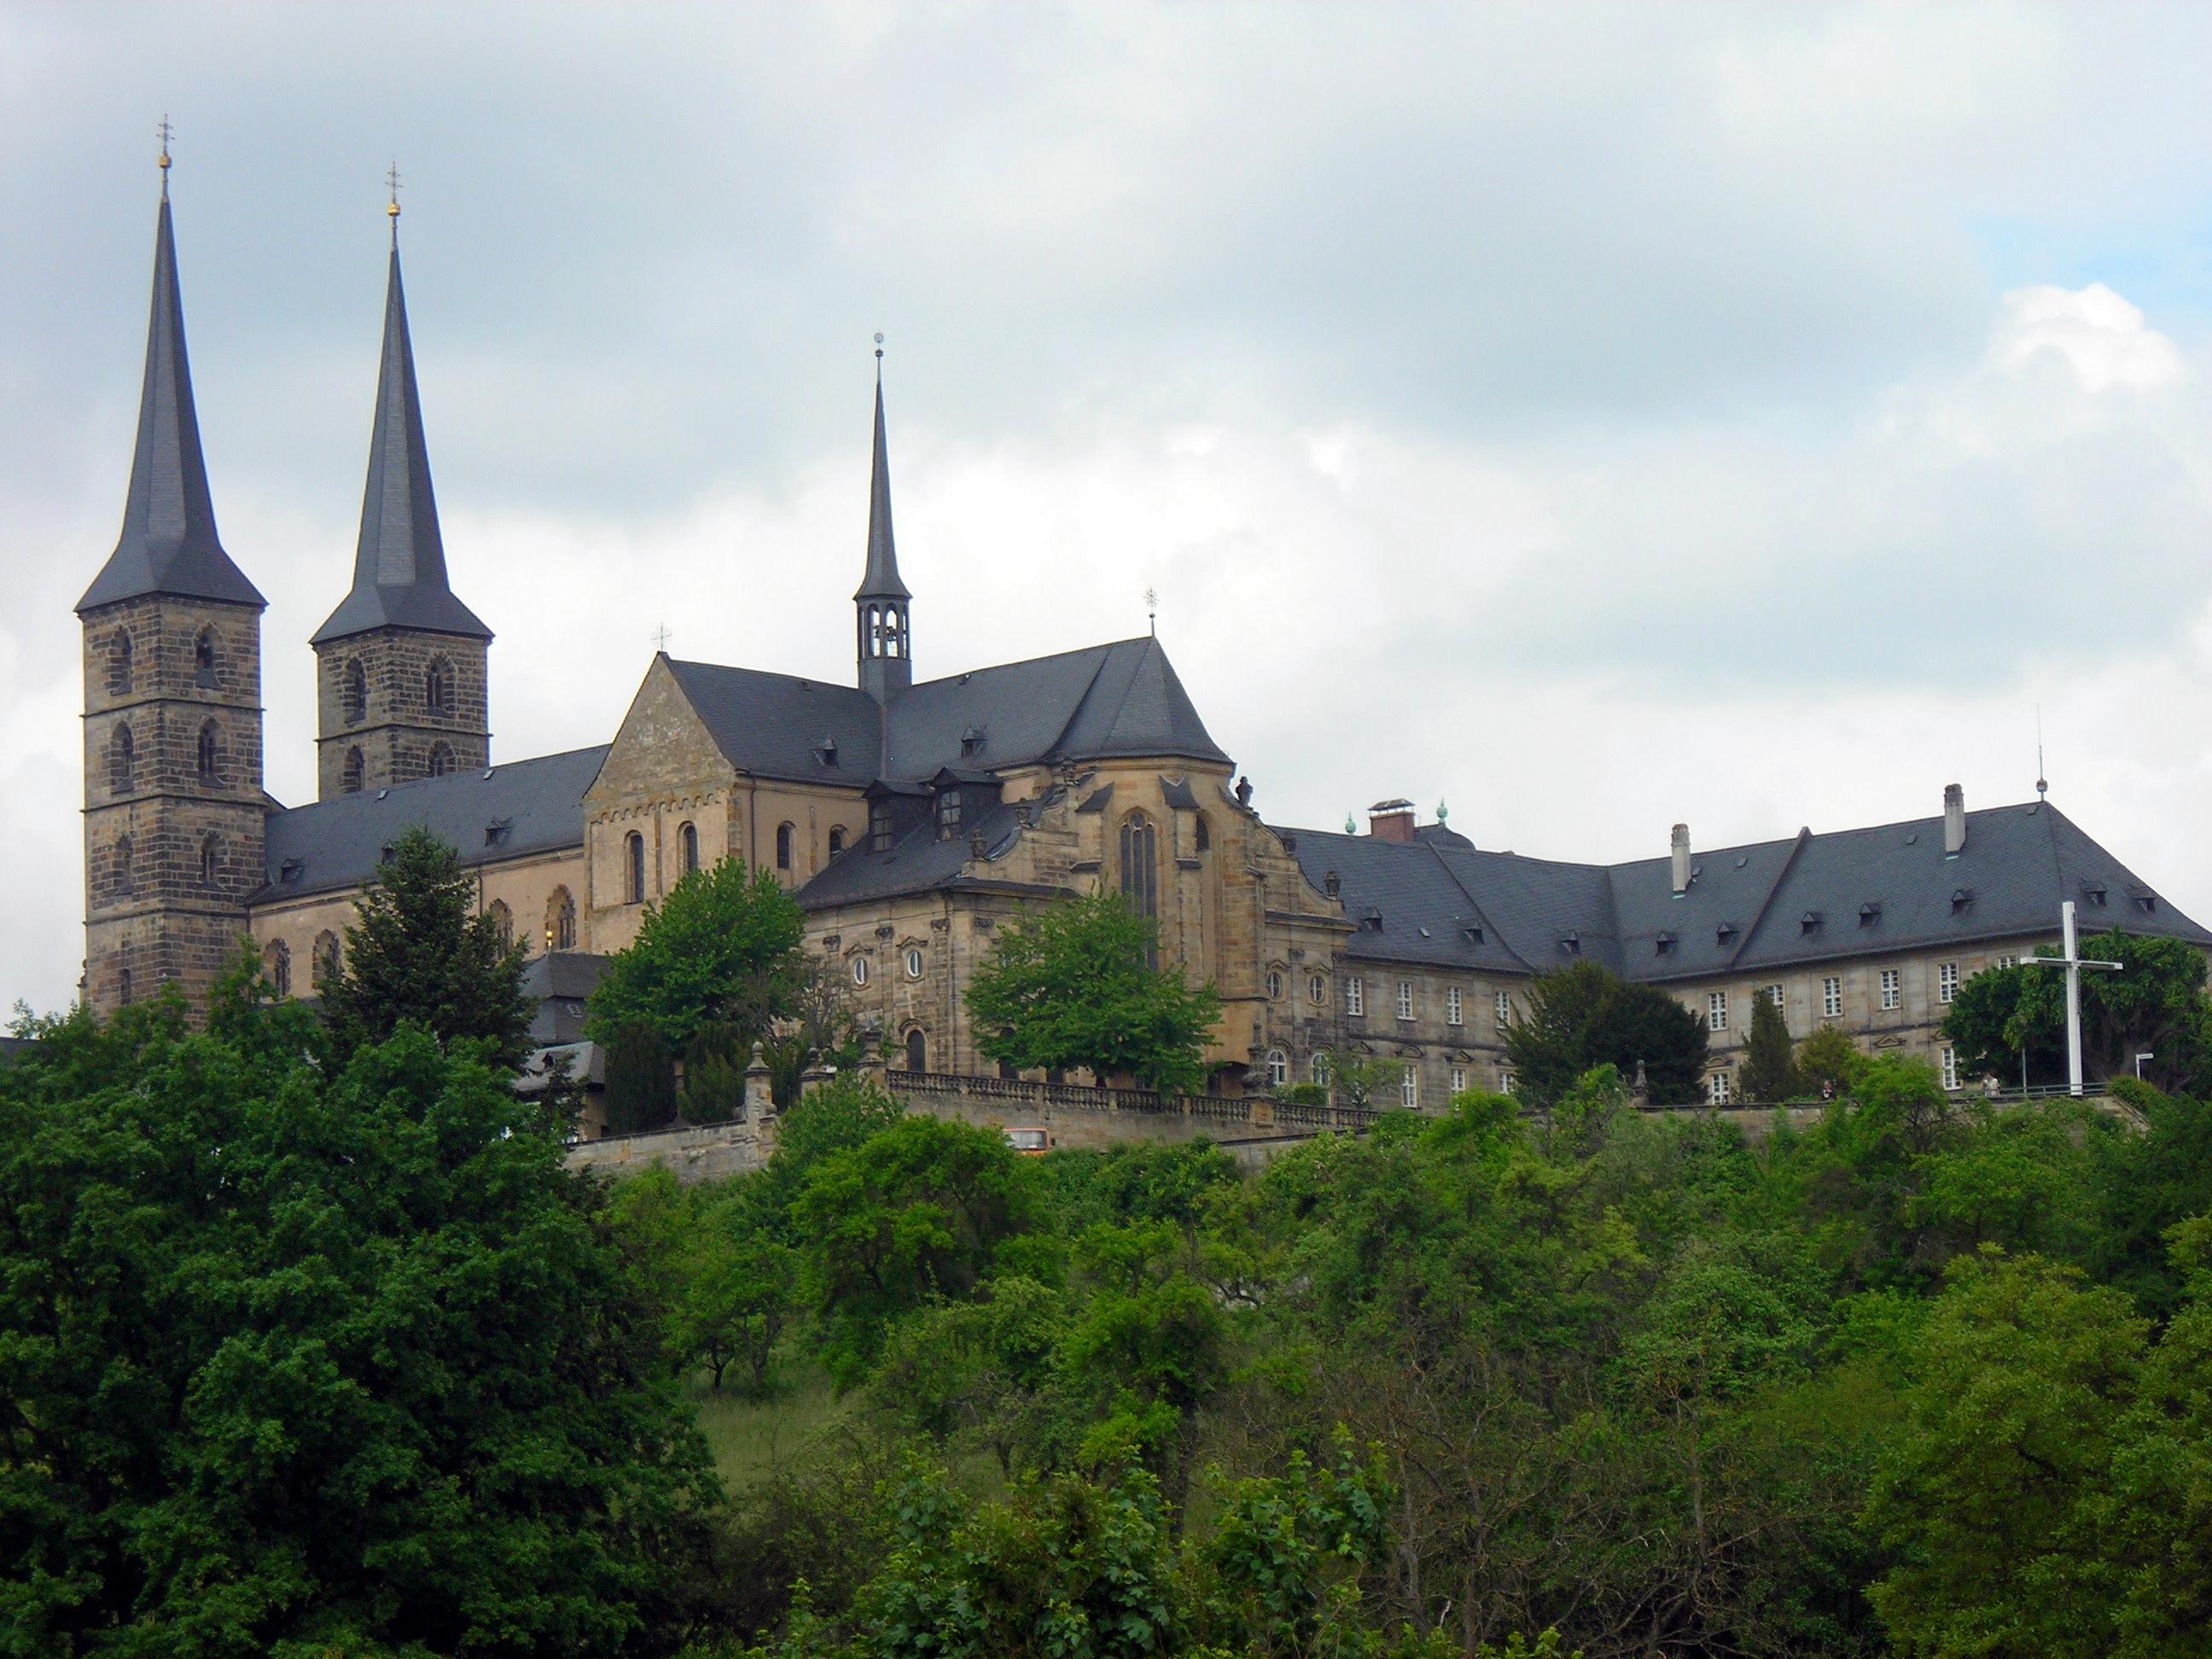 Michaelskirche Monastery